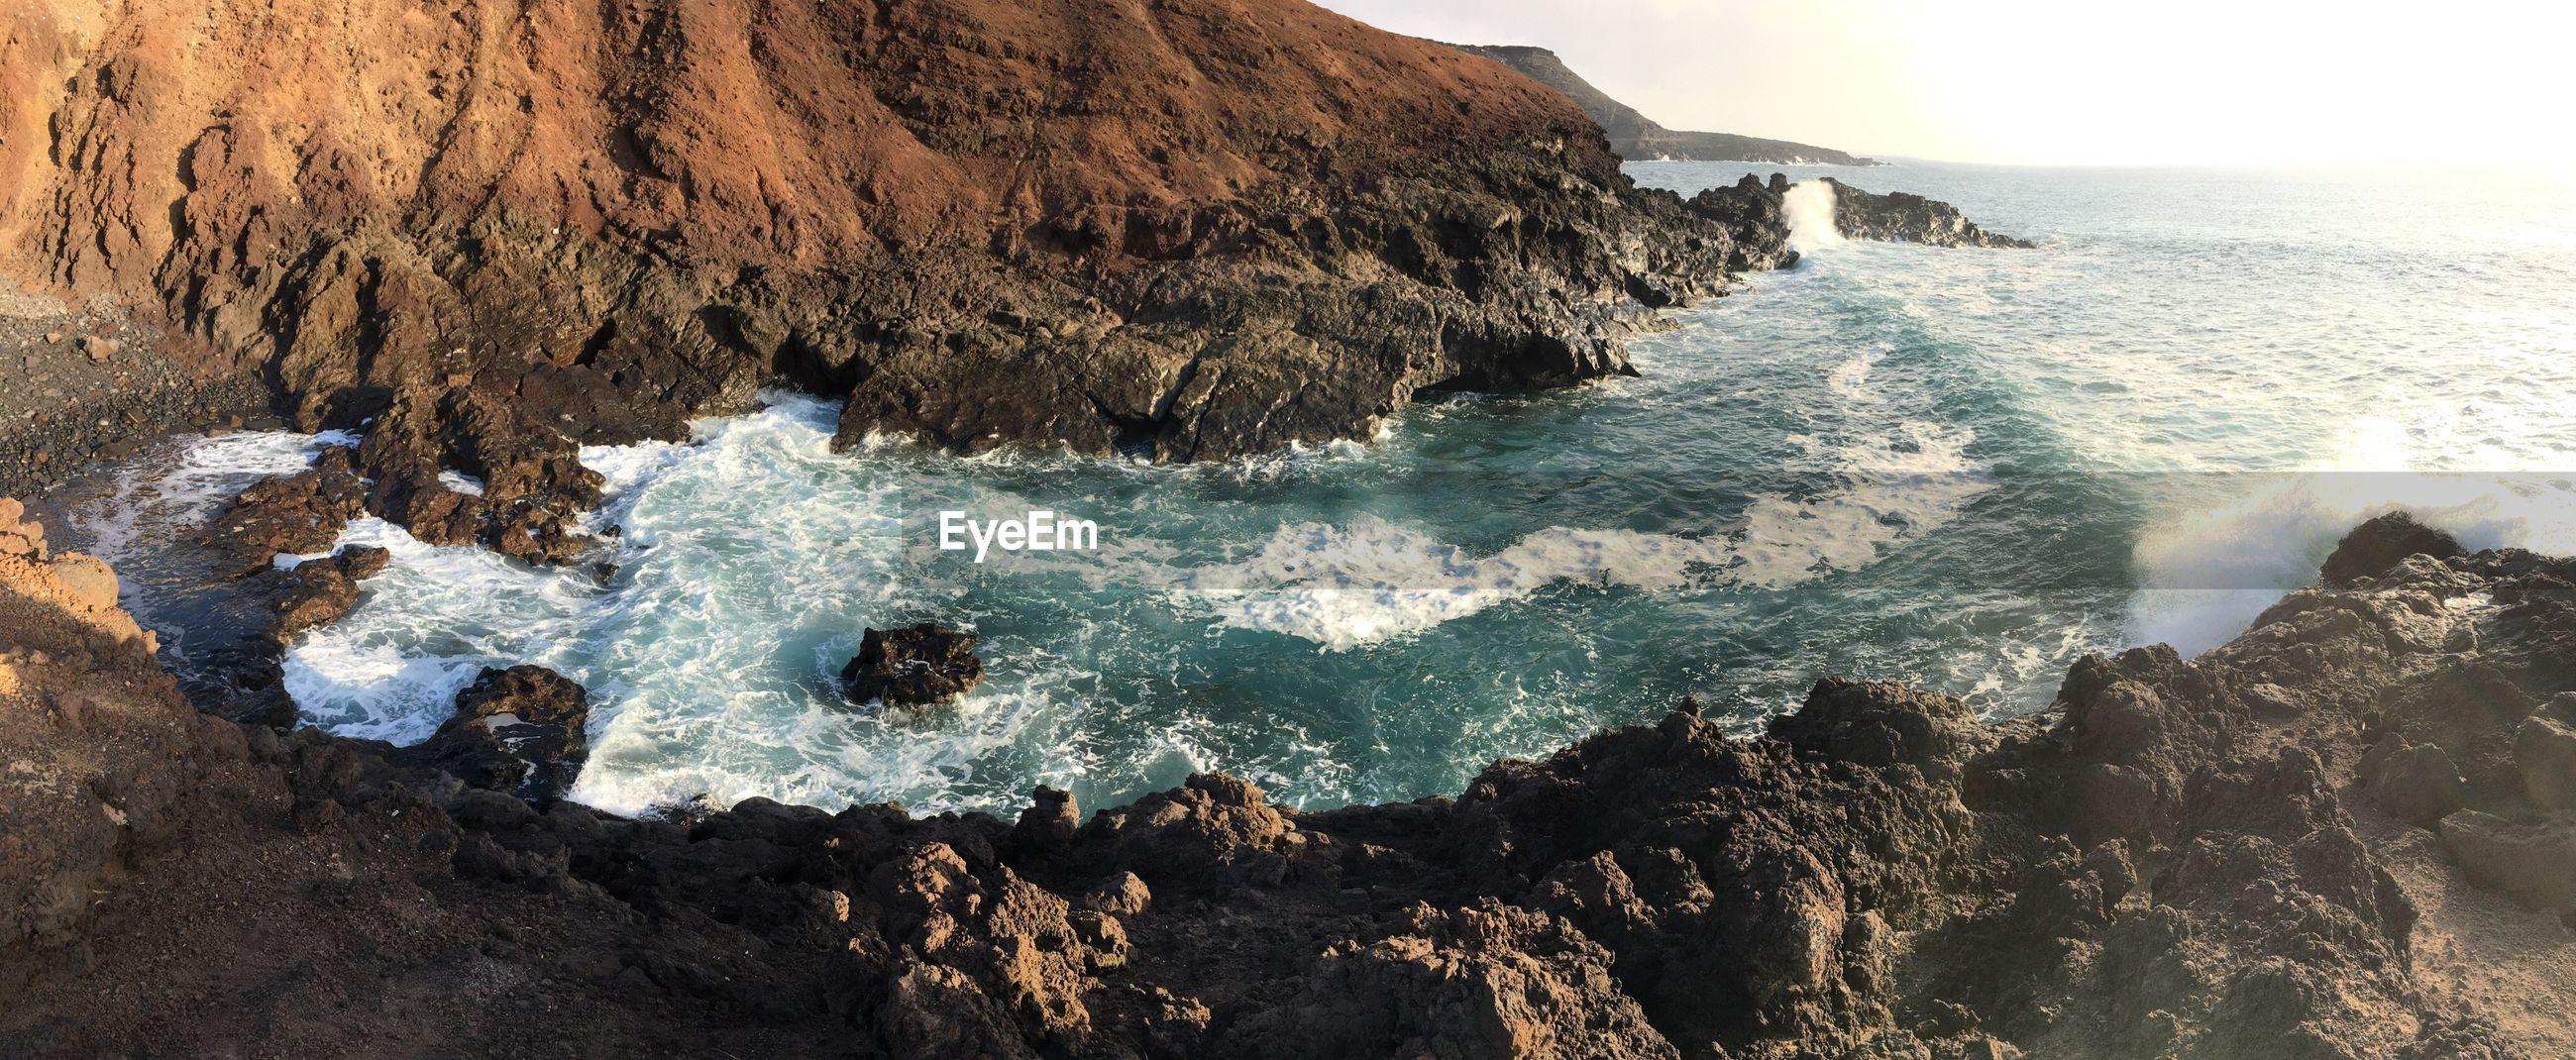 VIEW OF CALM BEACH AGAINST ROCKY COASTLINE